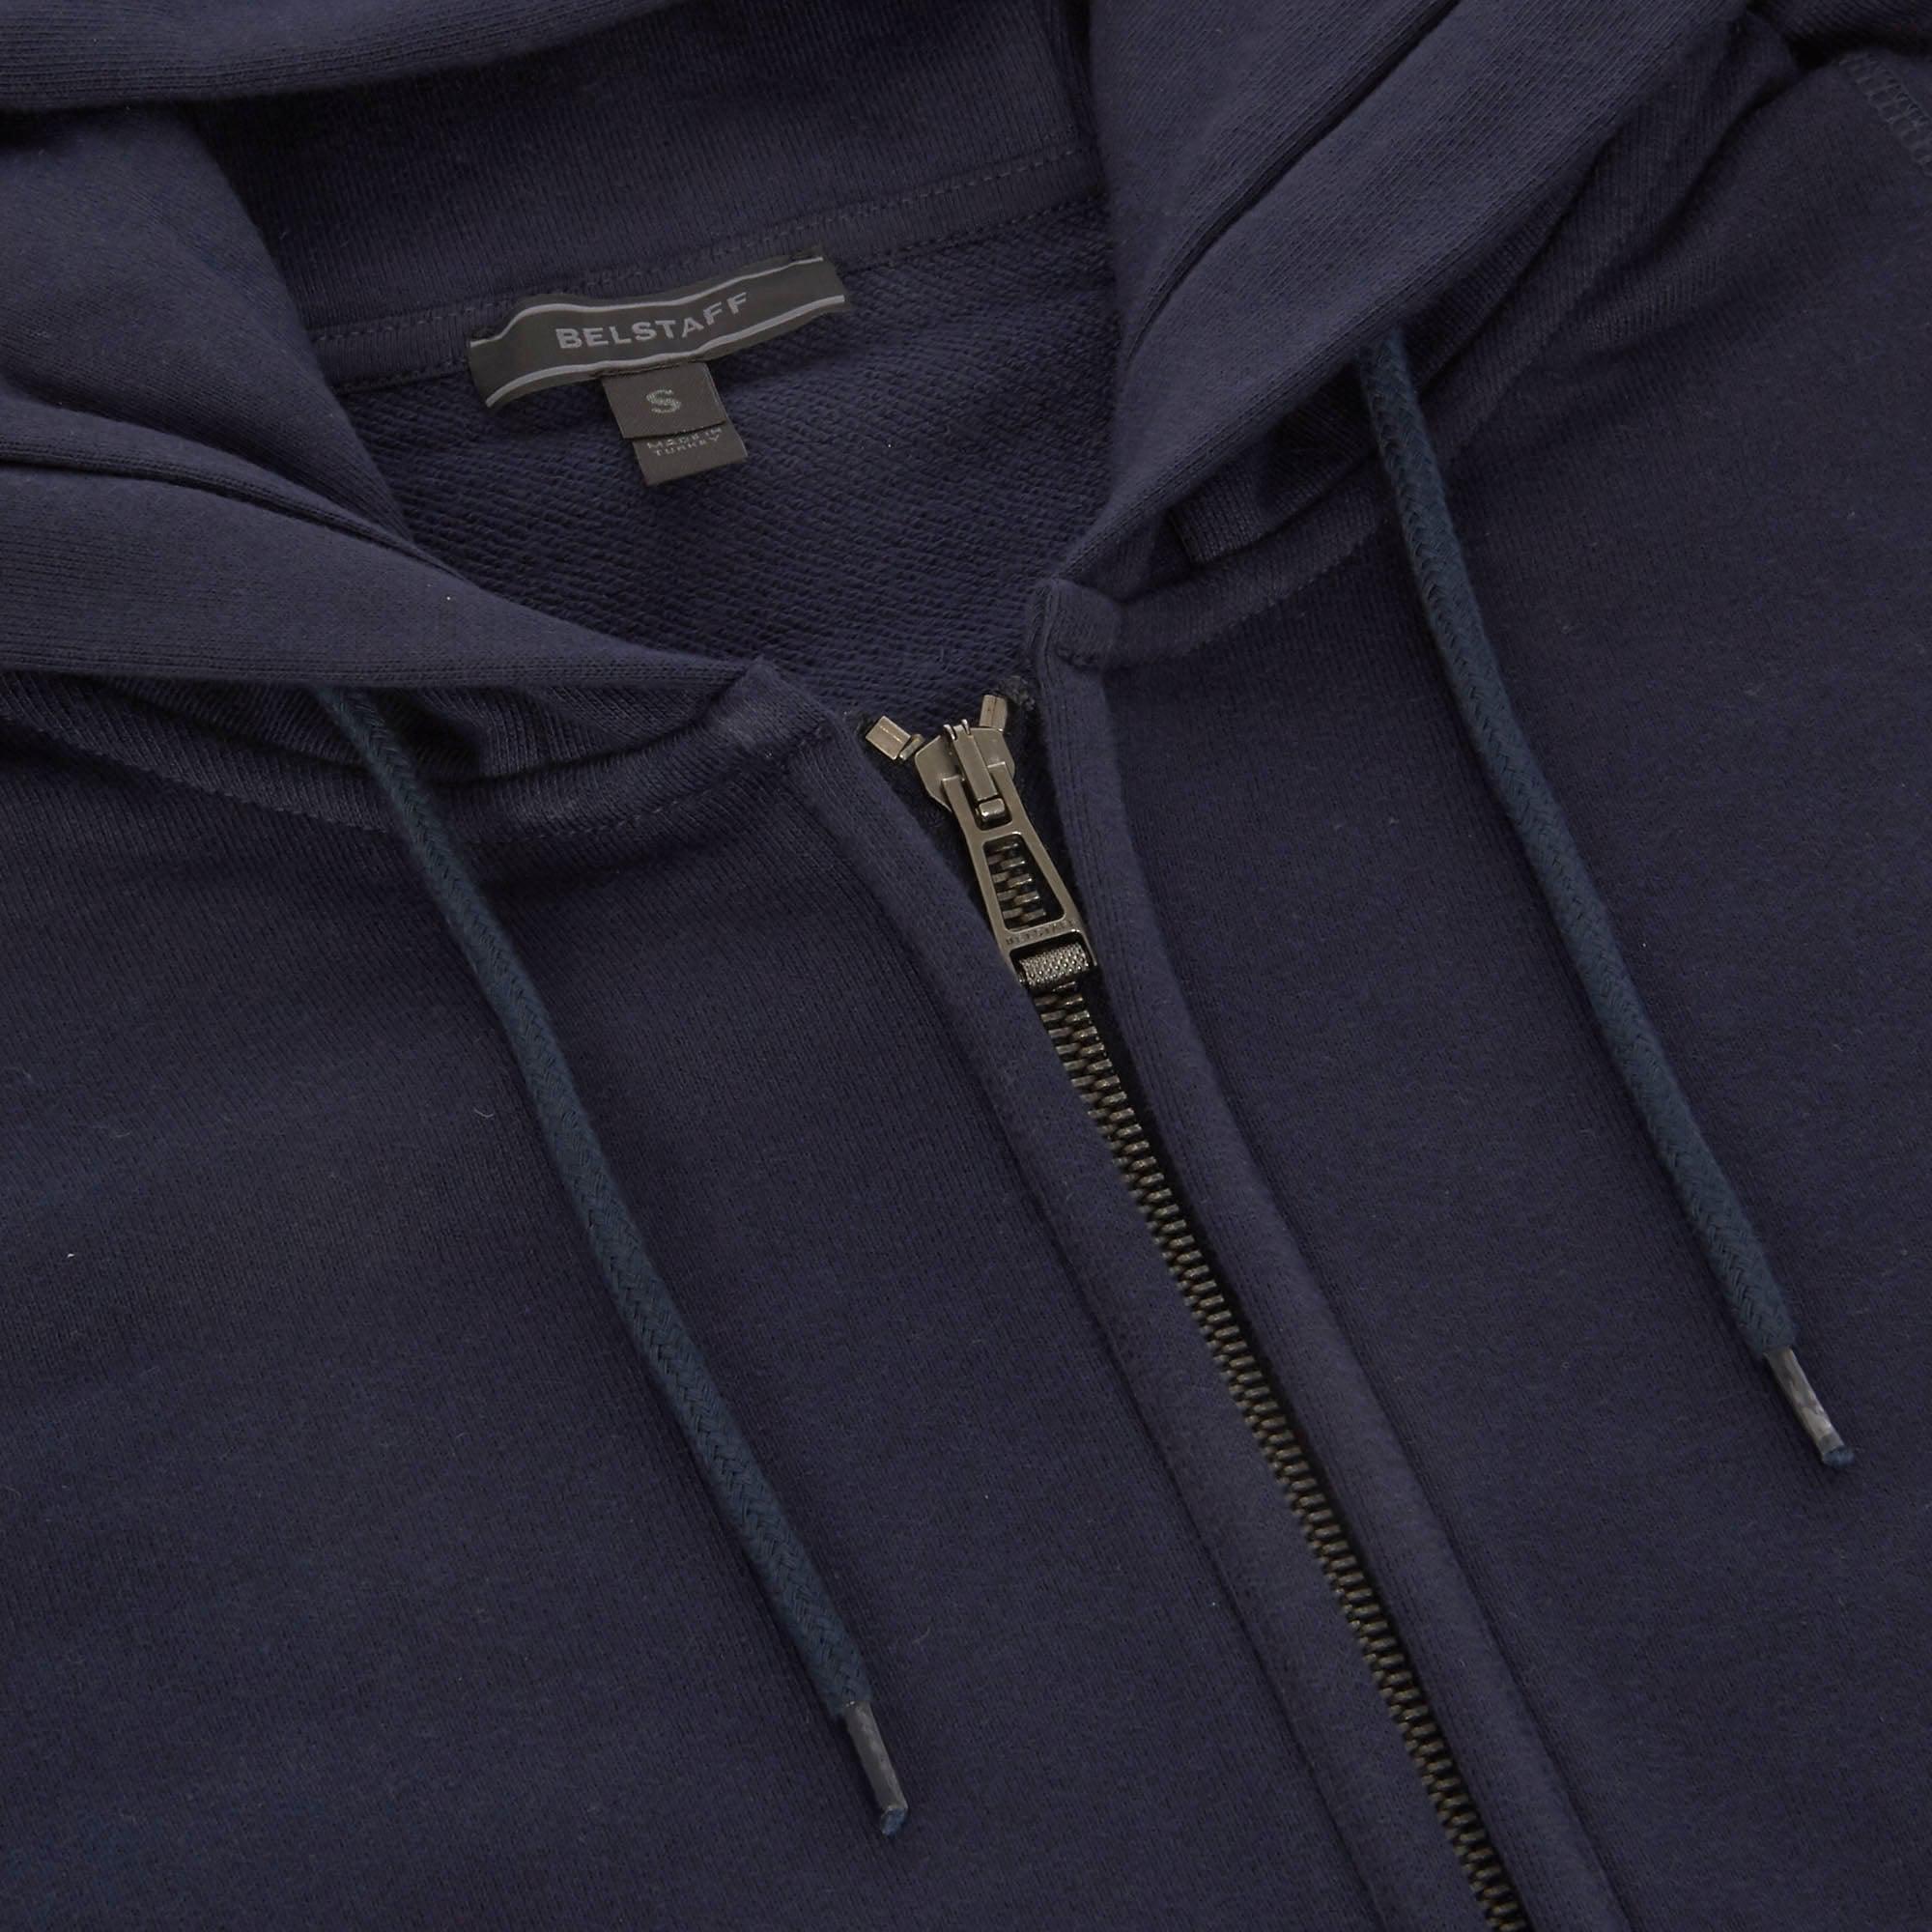 42c929685fa4 Belstaff - Blue Wentworth Hoodie - Navy for Men - Lyst. View fullscreen